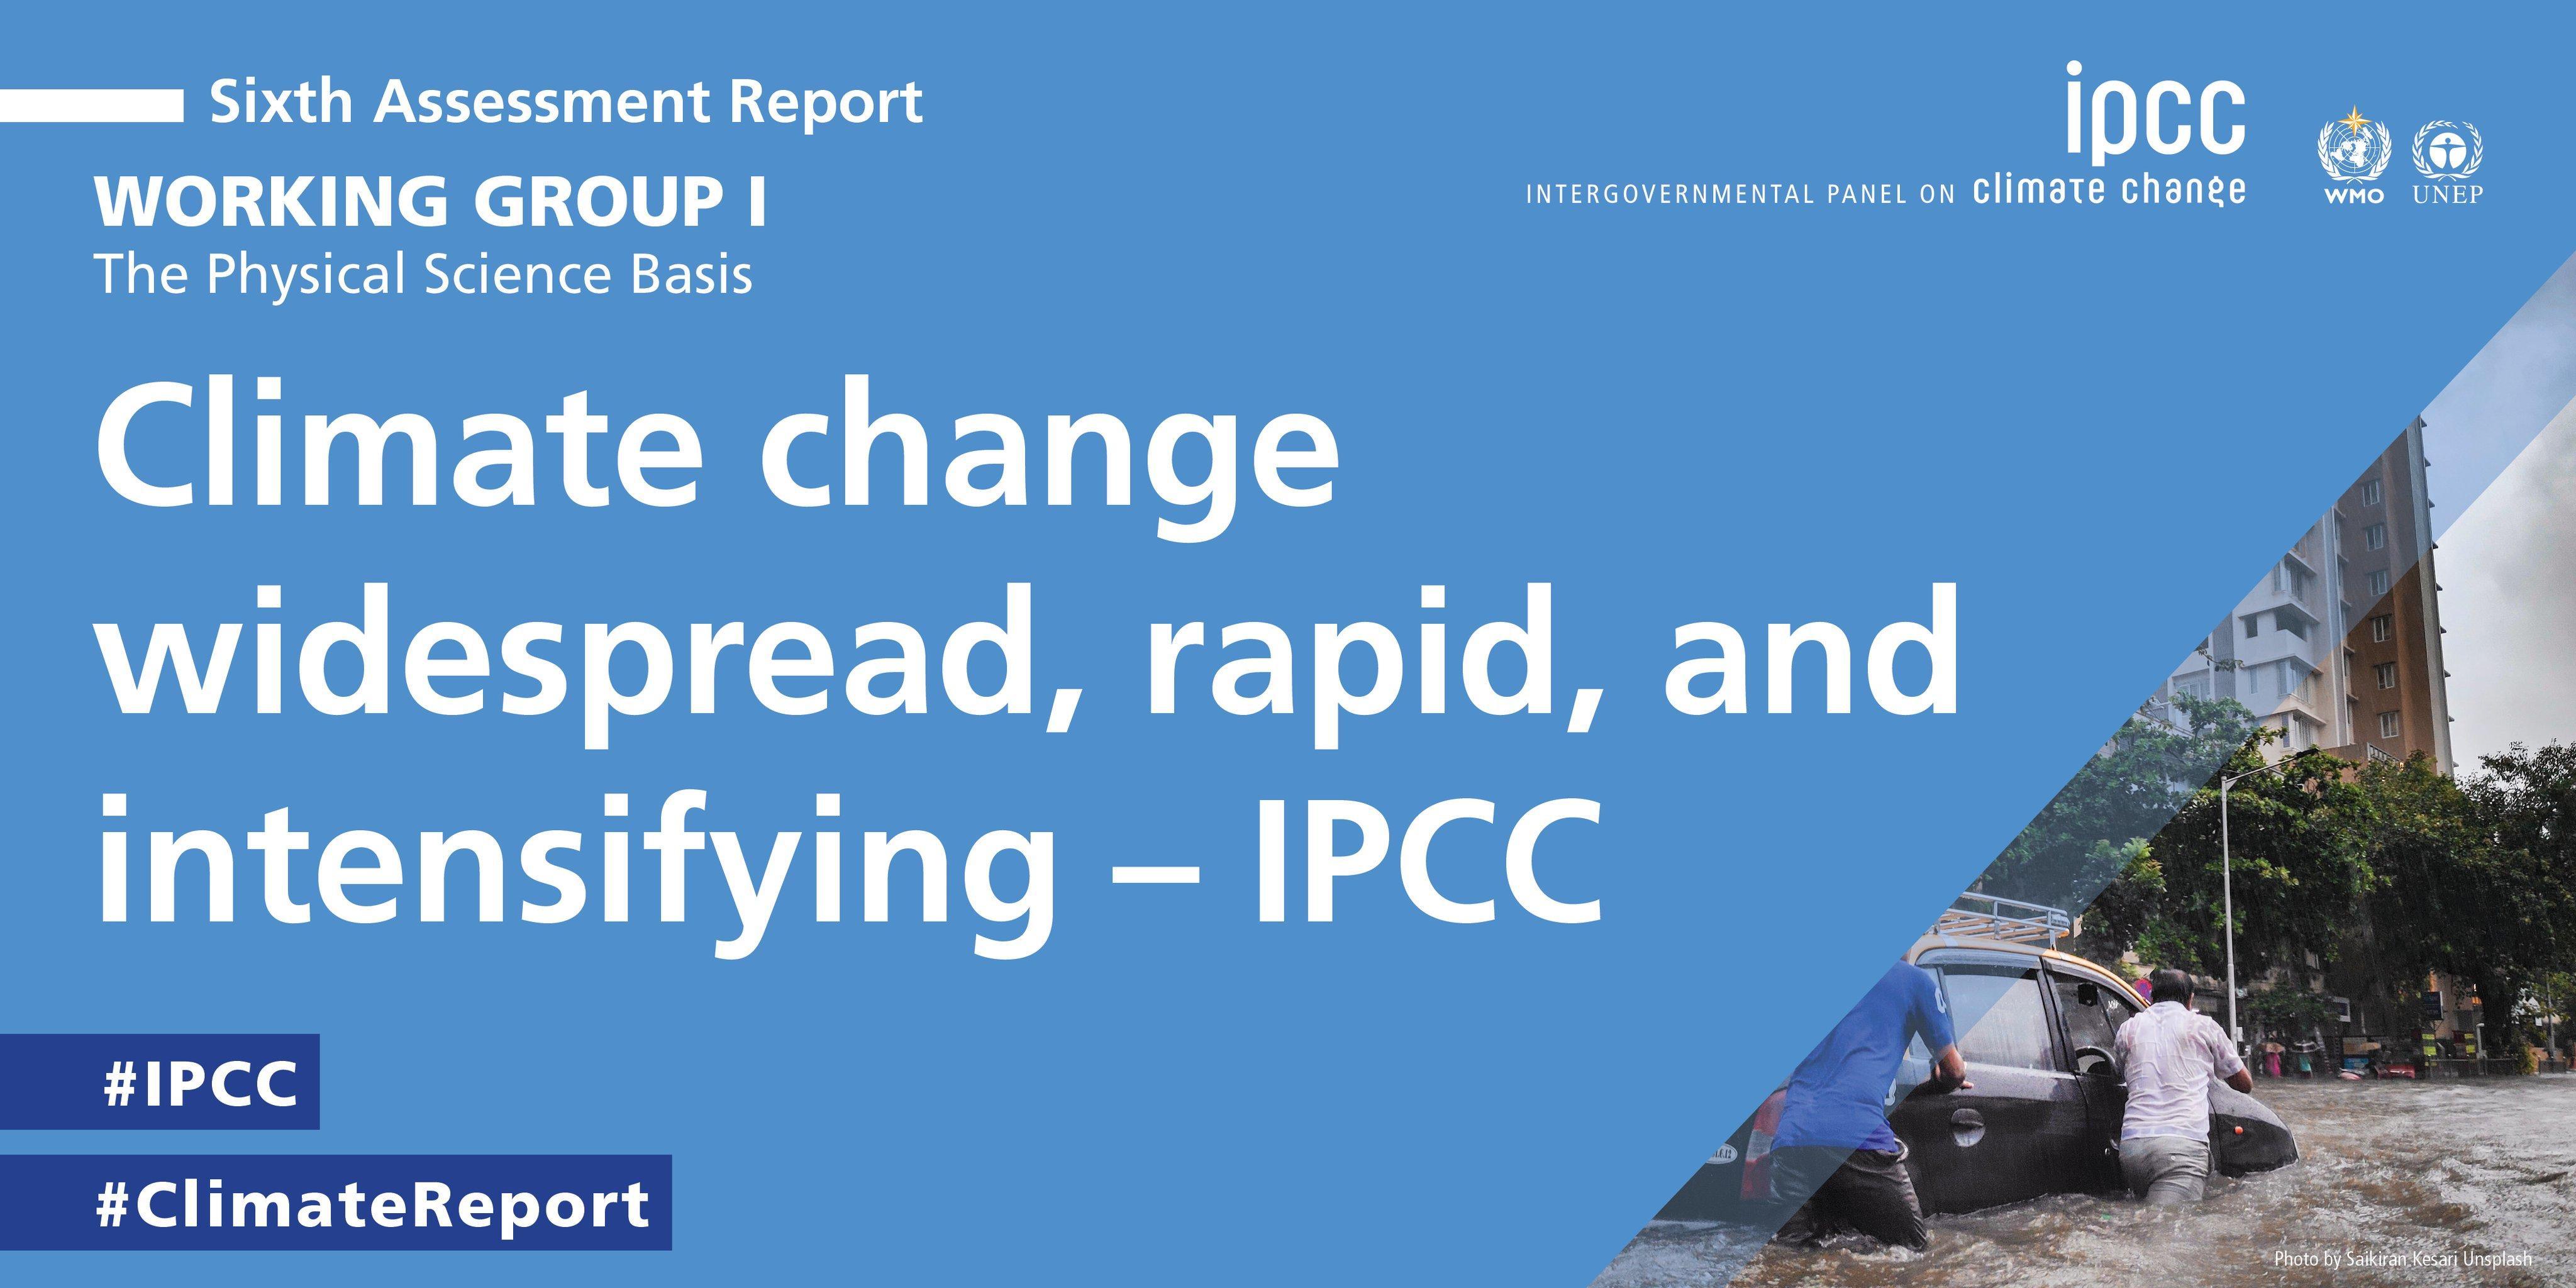 IPCC Working Group I report